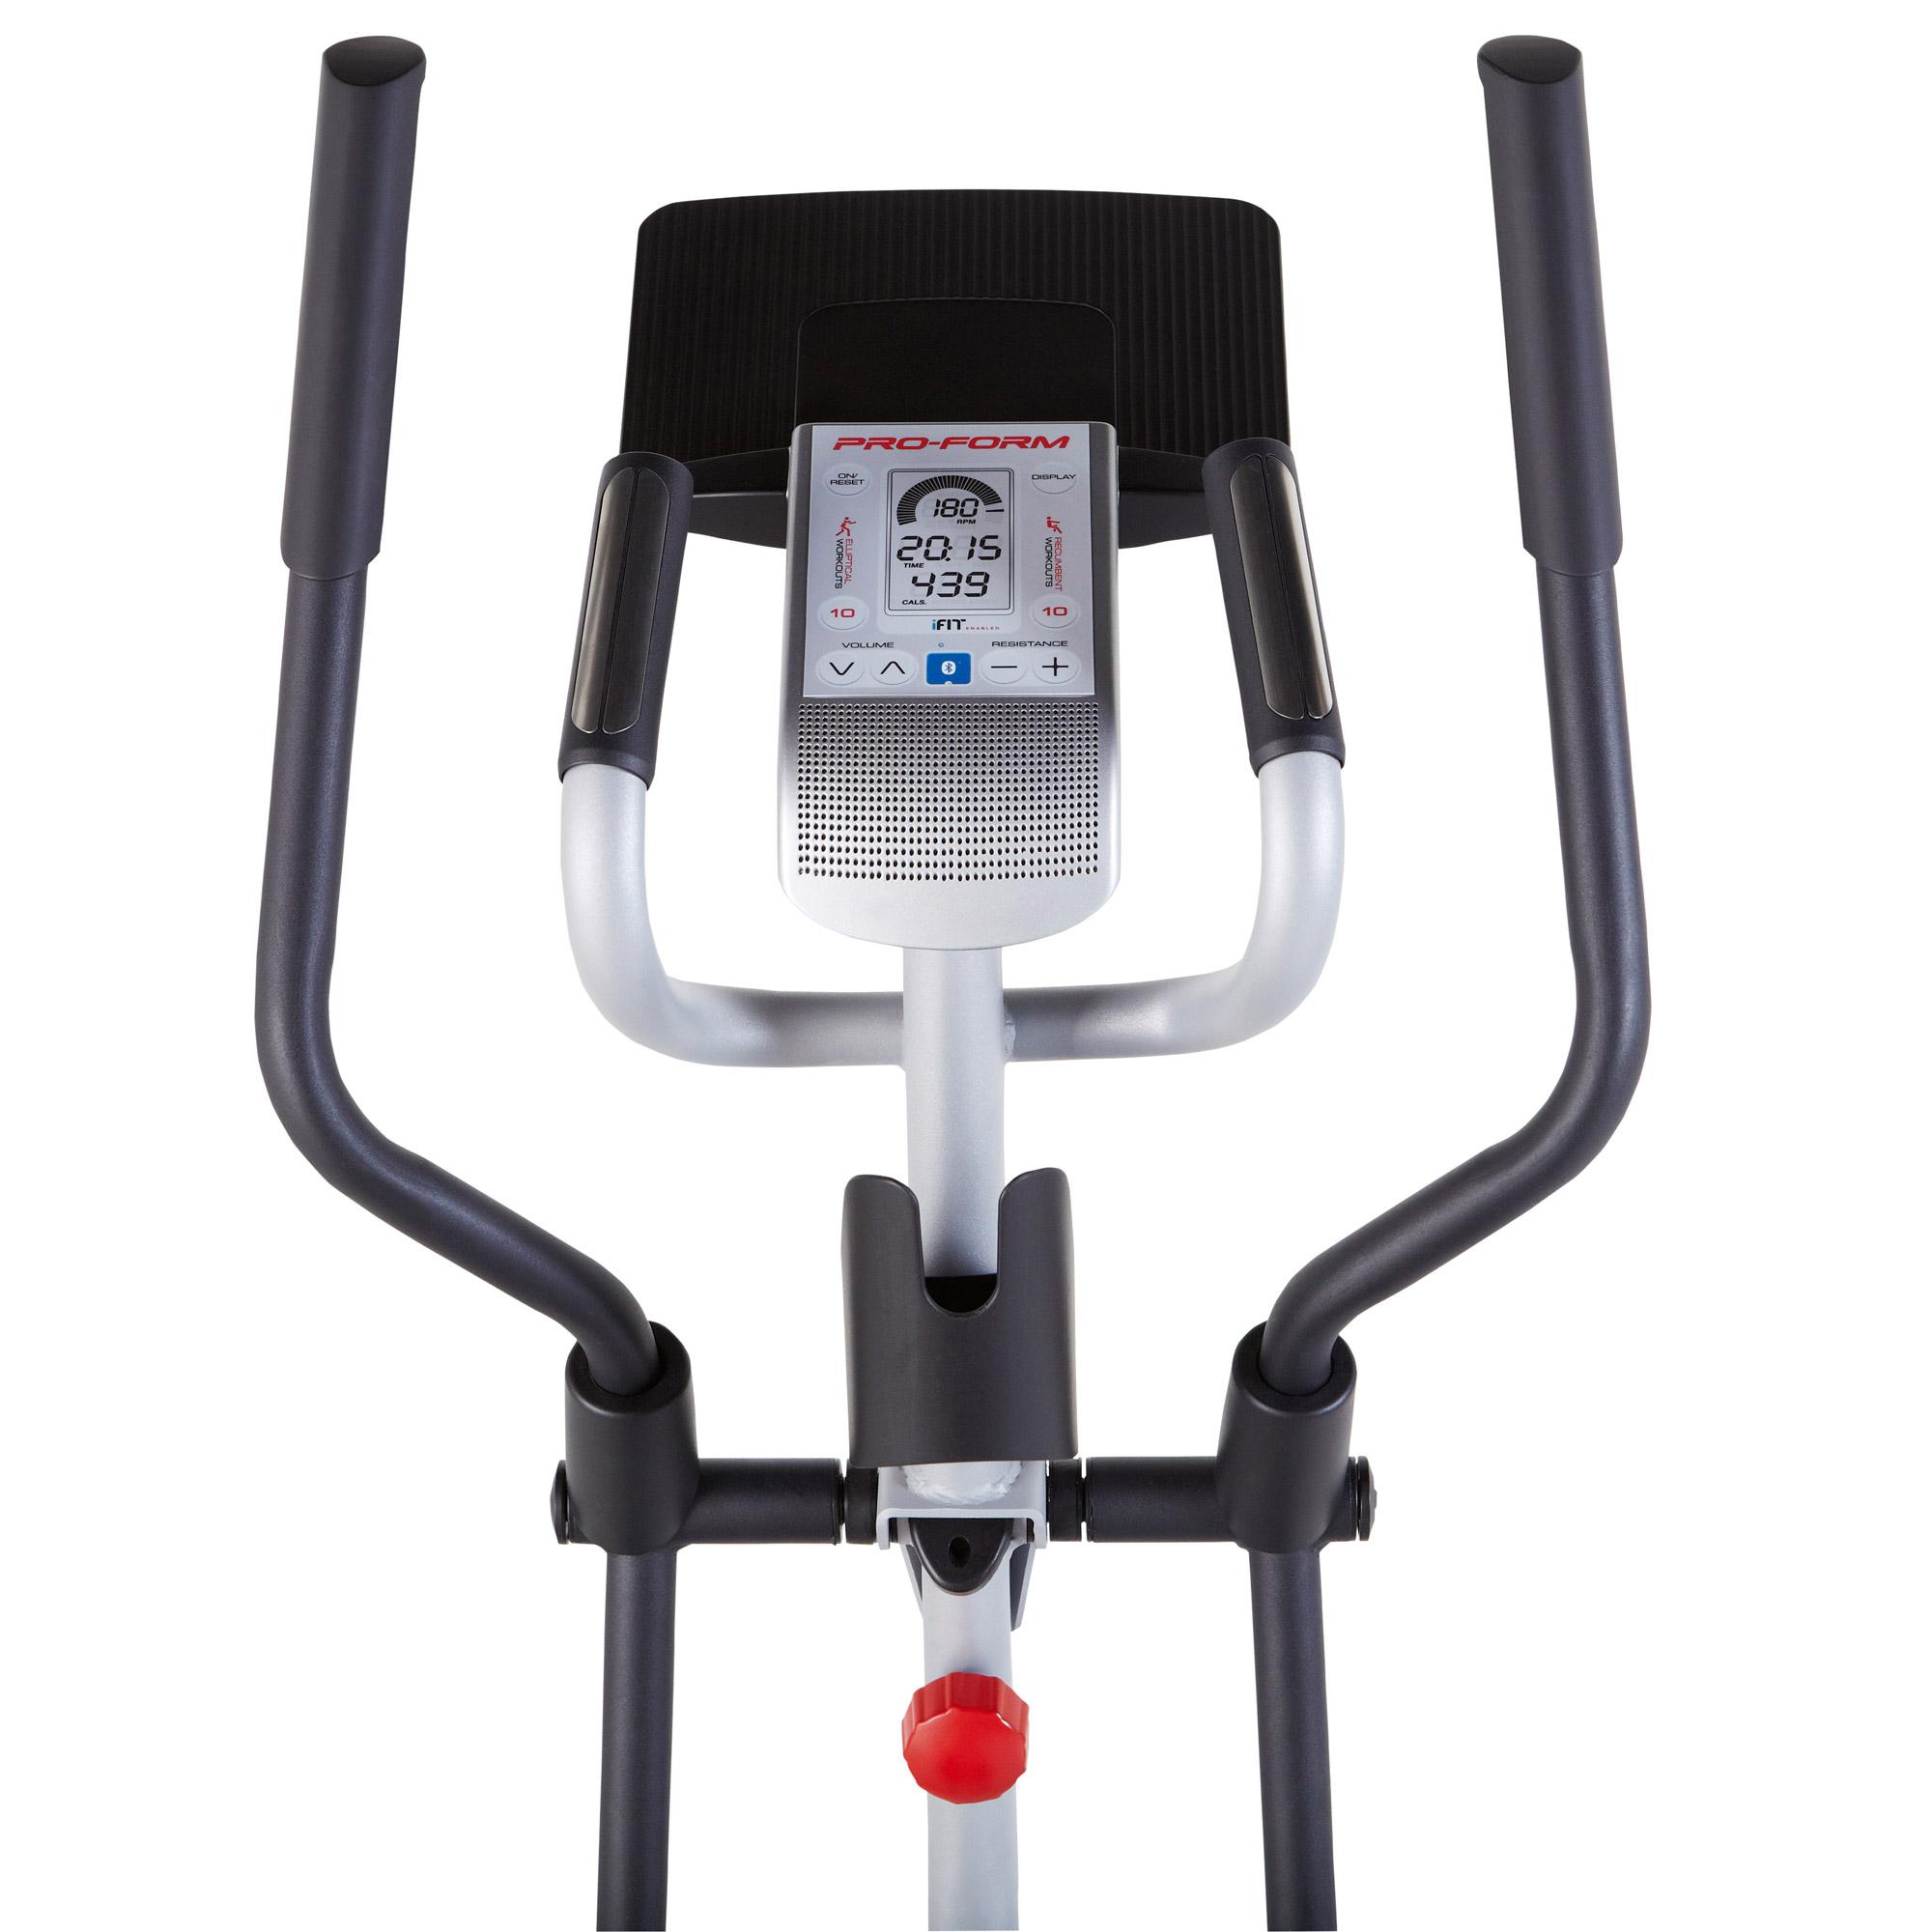 trainer elliptical crossover bike pro mat floor mats hybrid exercise resource itm proform cardio